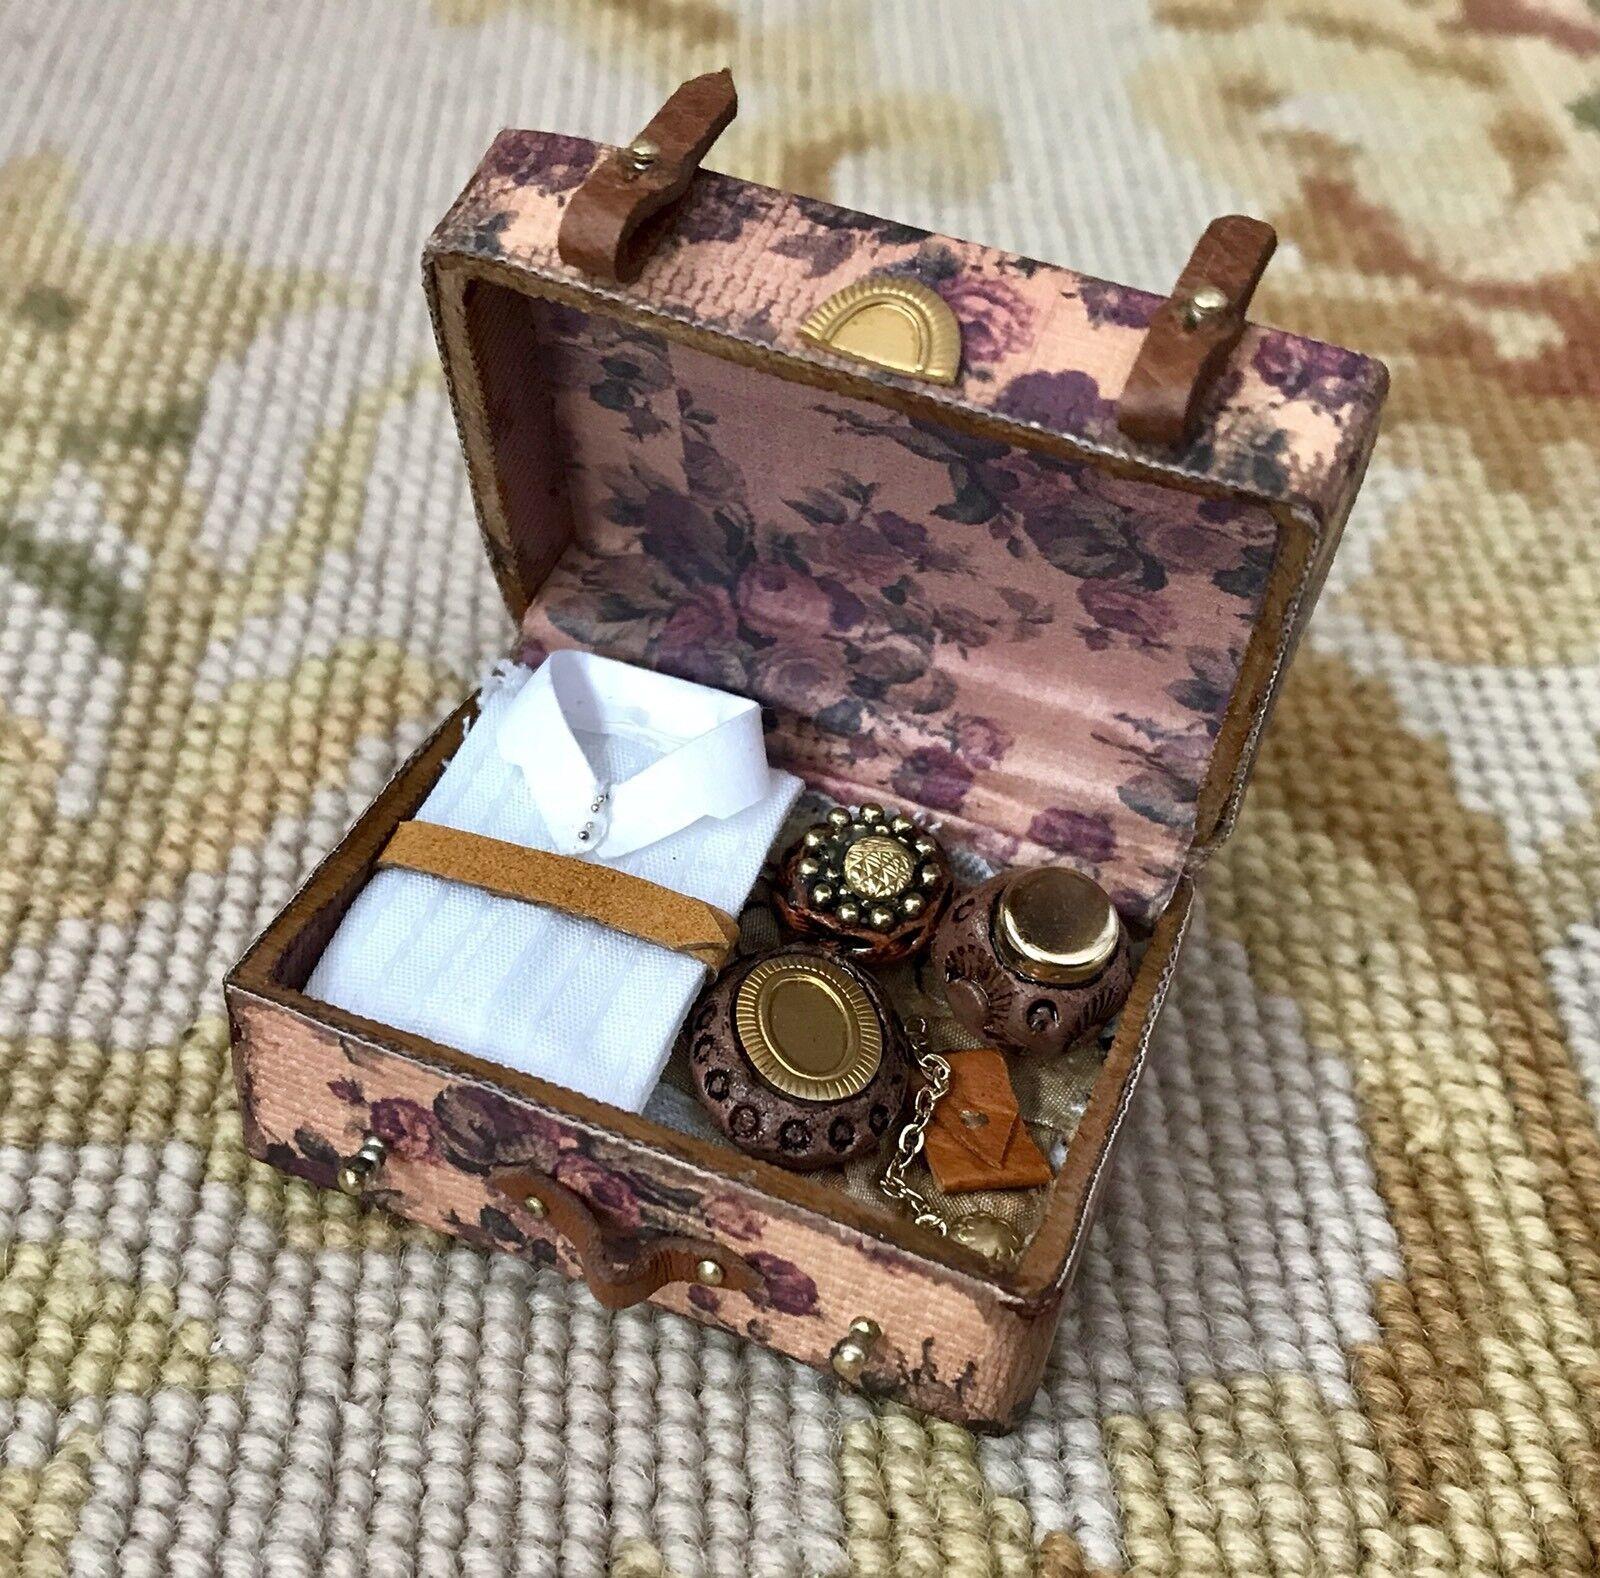 Pat Tyler Casa de Muñecas en Miniatura Floral Bolsa de equipaje maleta medio llena p904